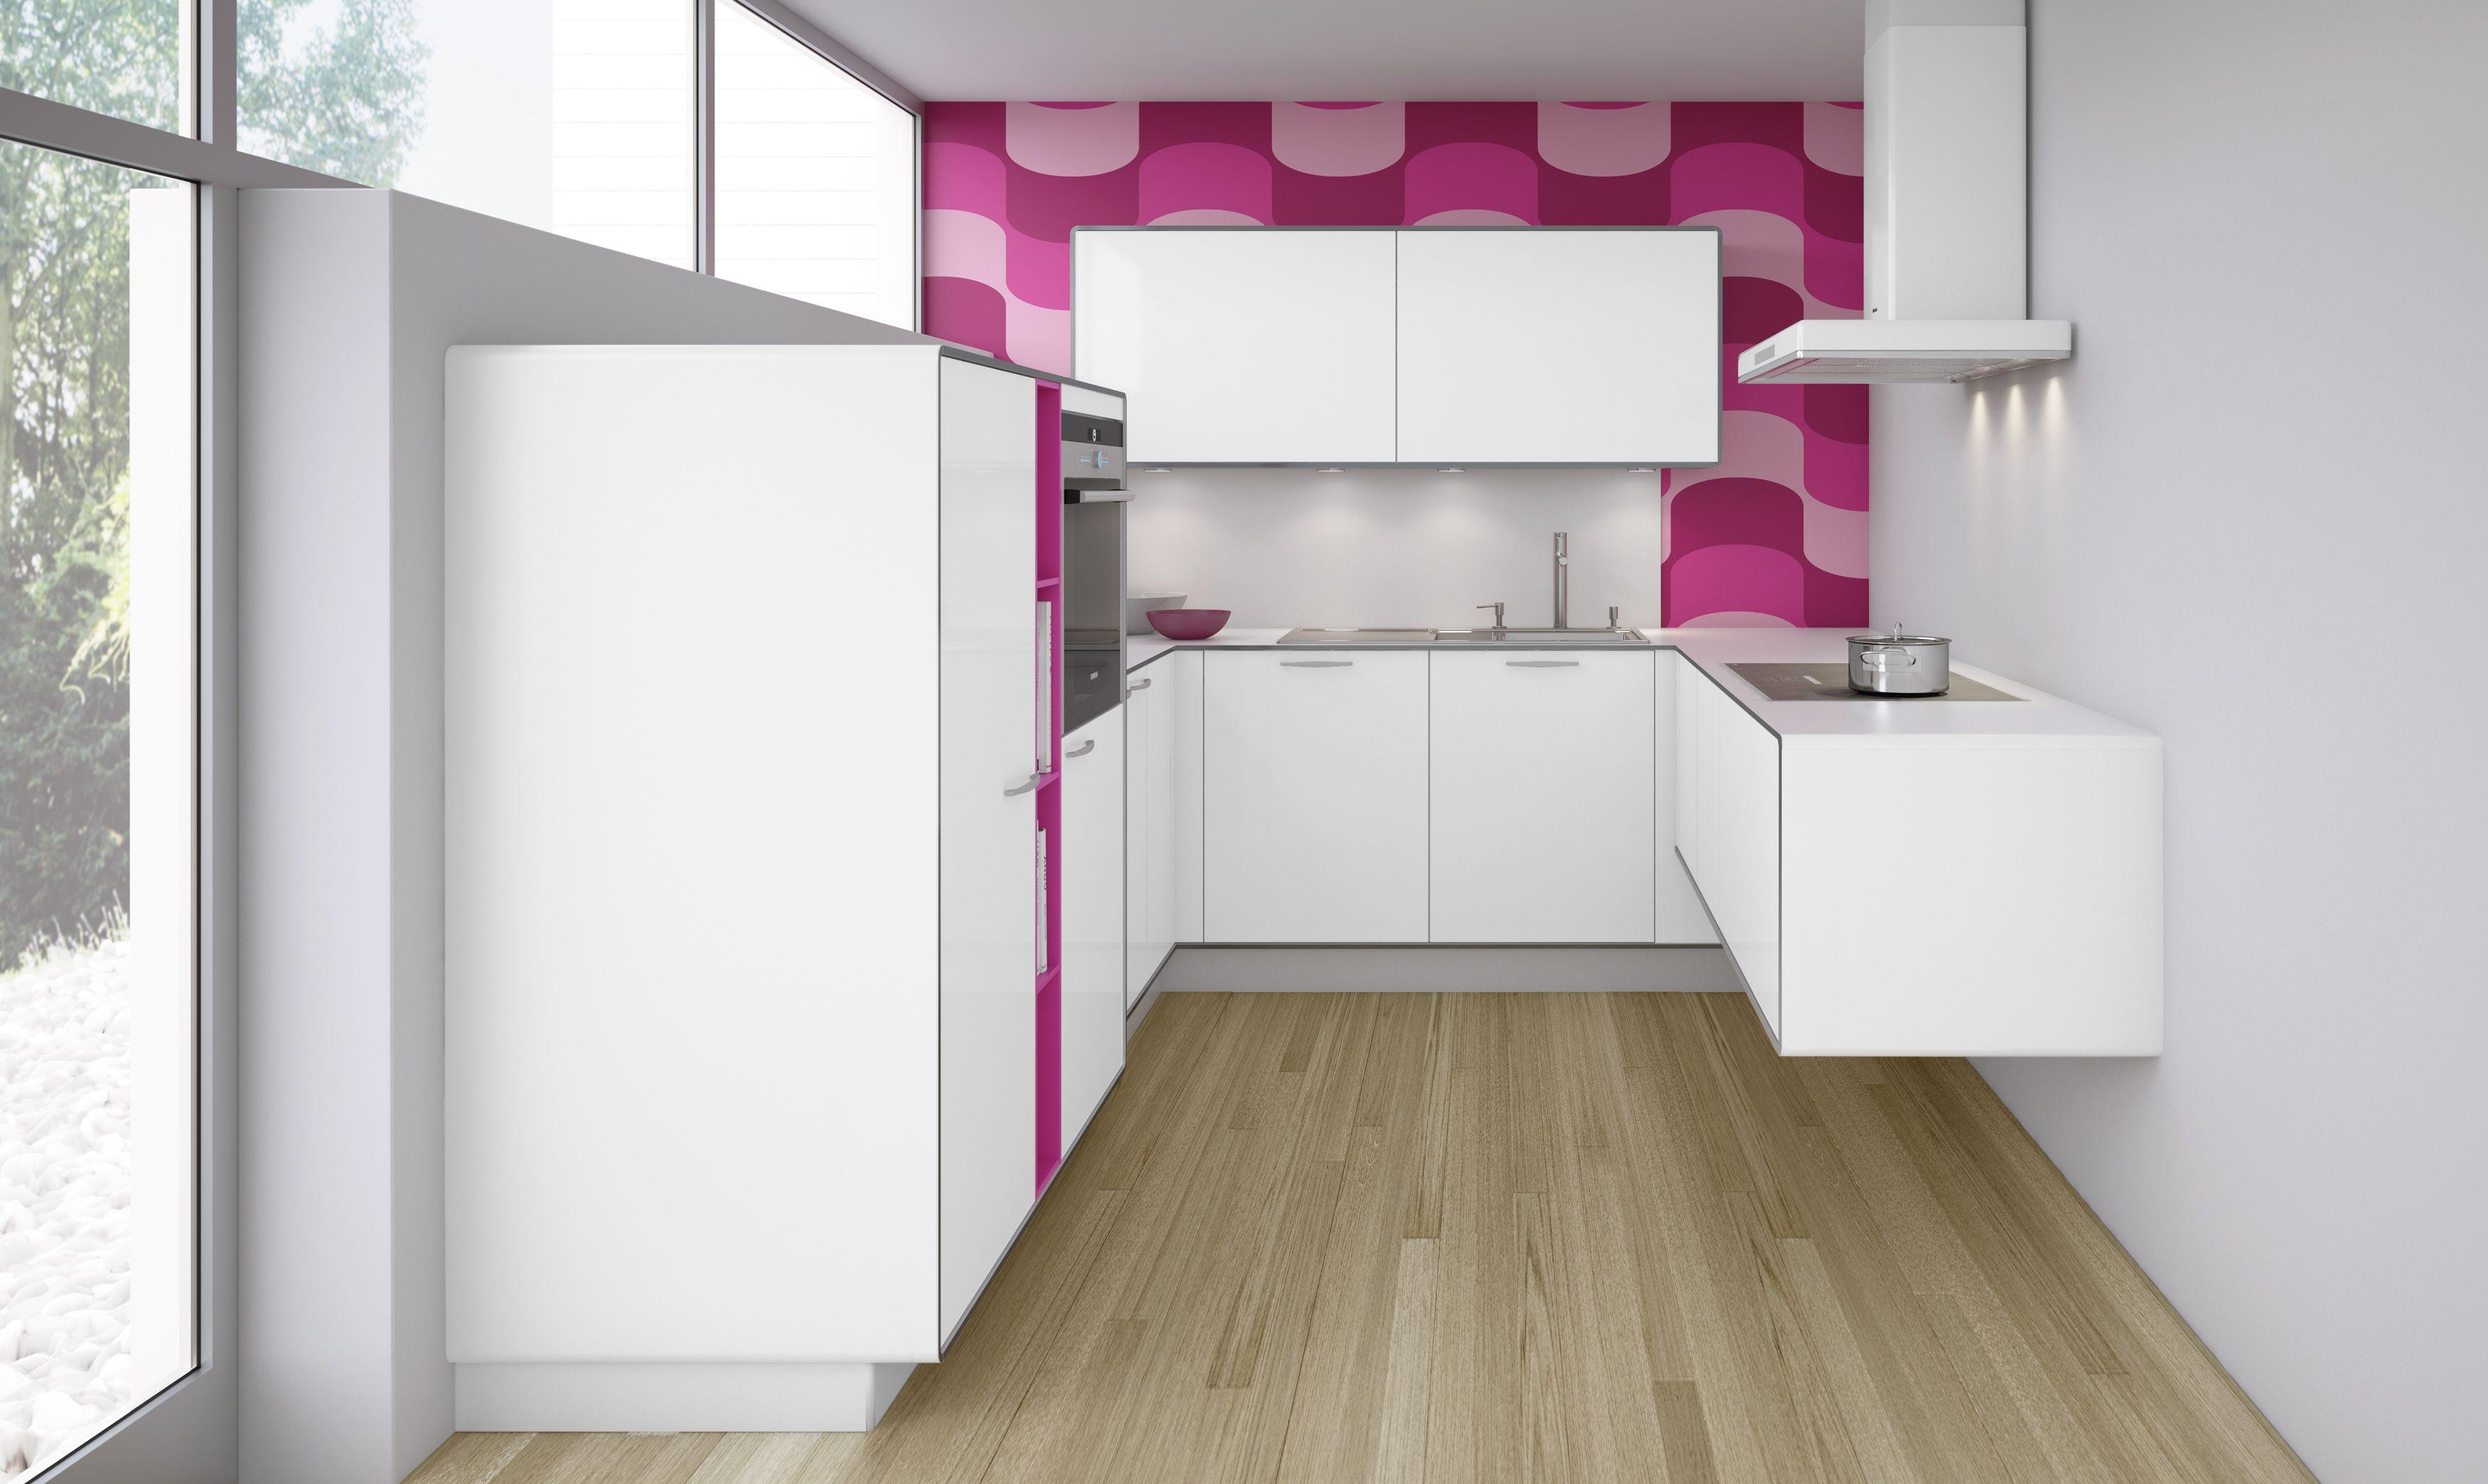 Pia Icy White W A Splash Of Hot Pink From Allmilmo Design Interior Home Decor